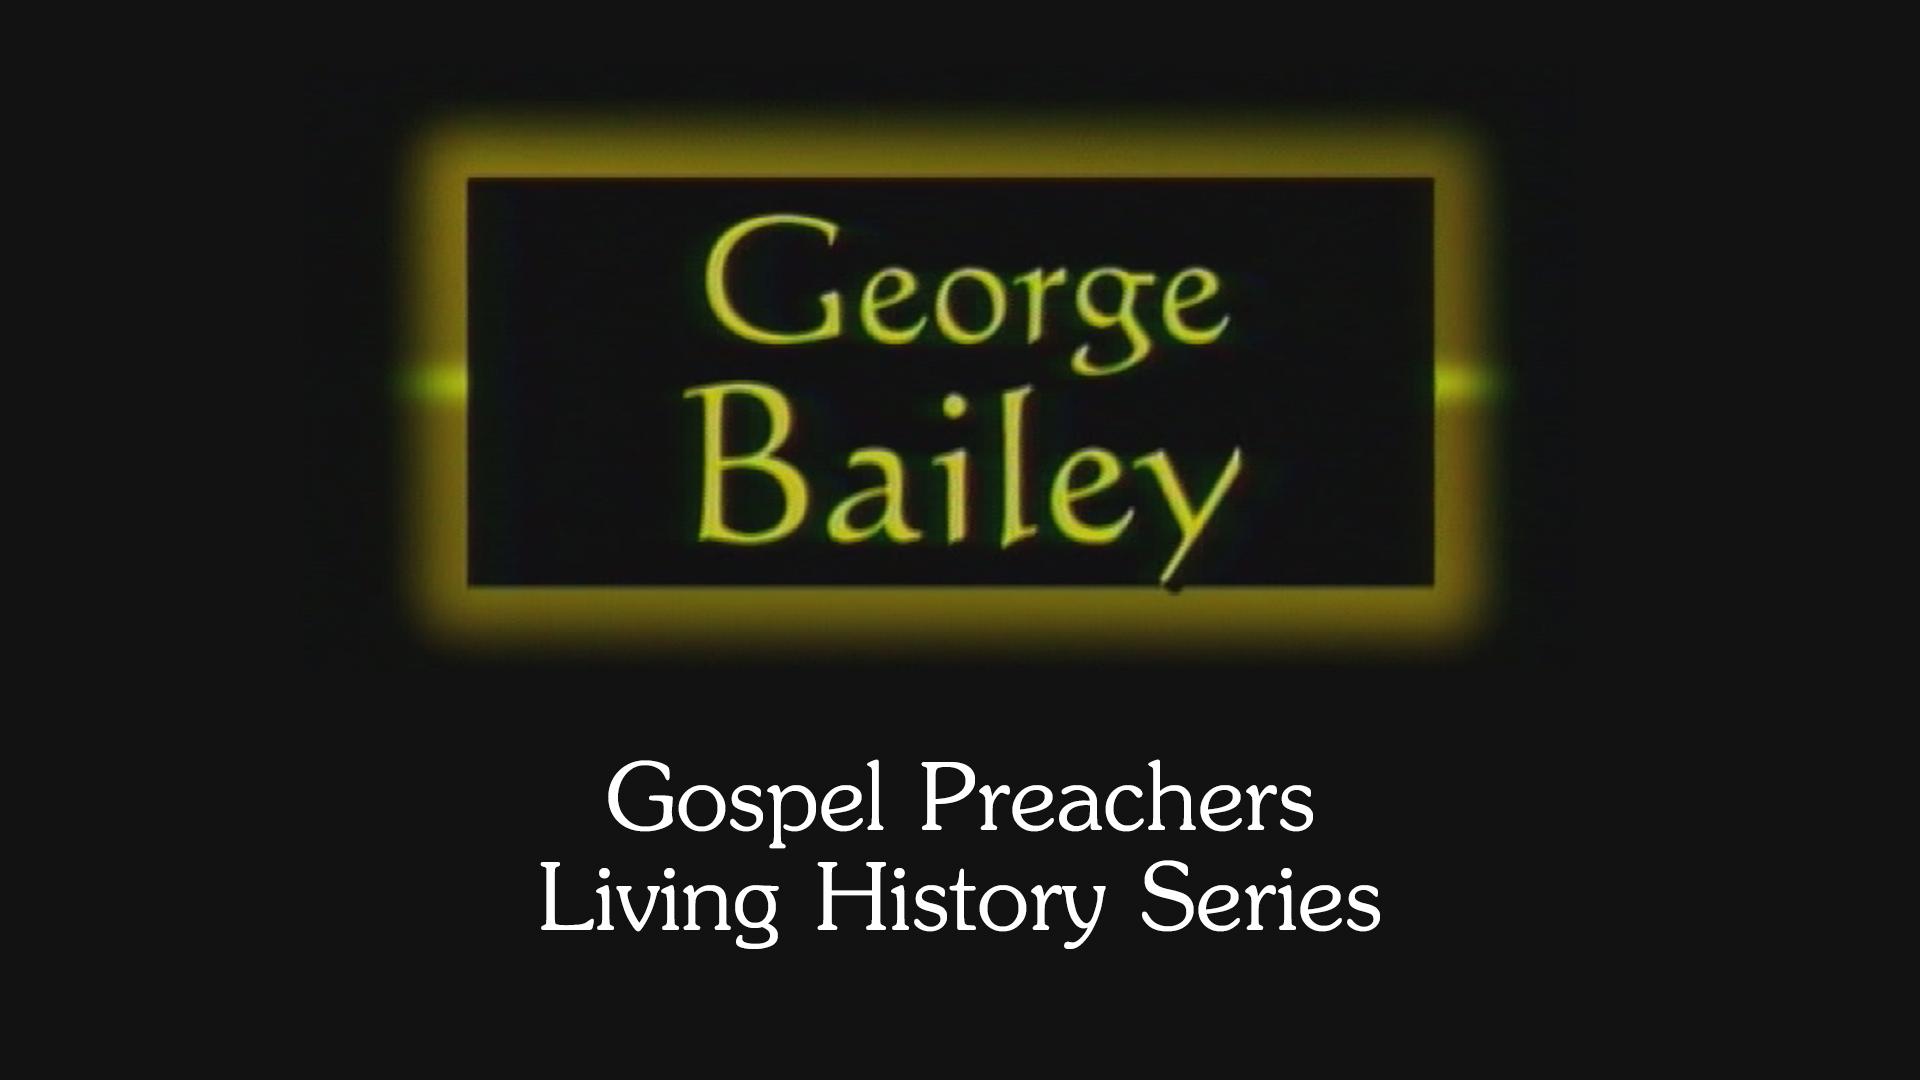 George Bailey | Gospel Preachers Living History Series